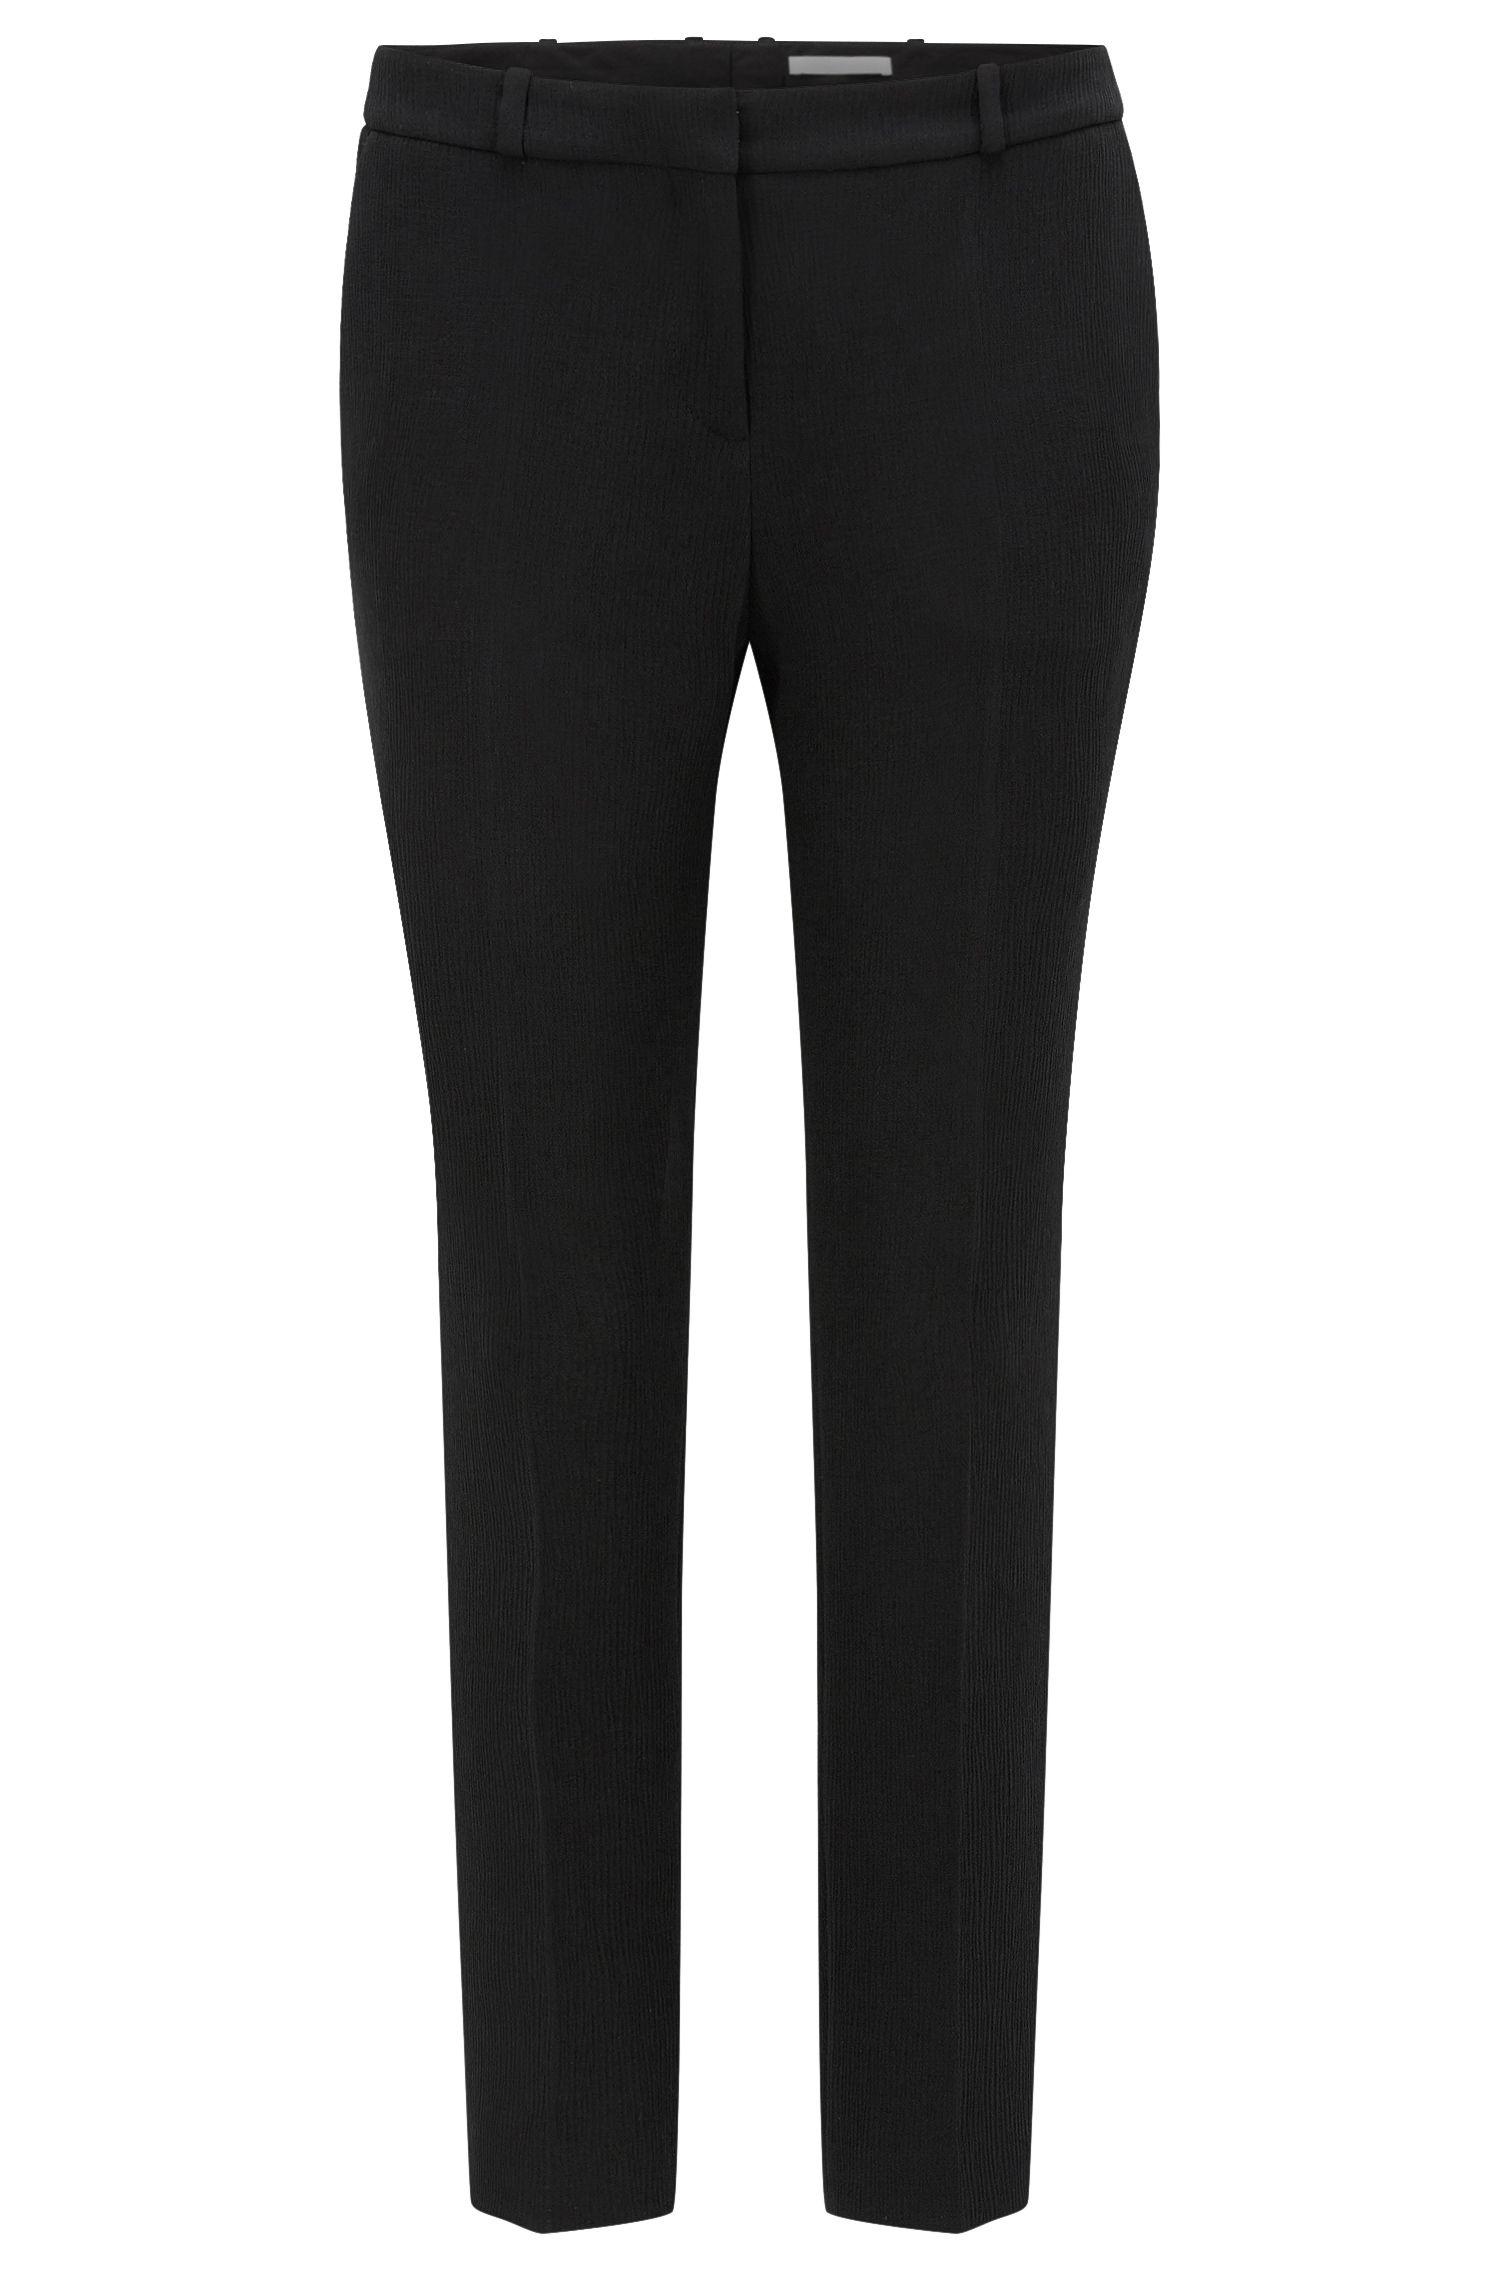 'Tanitea' | Crepe Cropped Suiting Pants